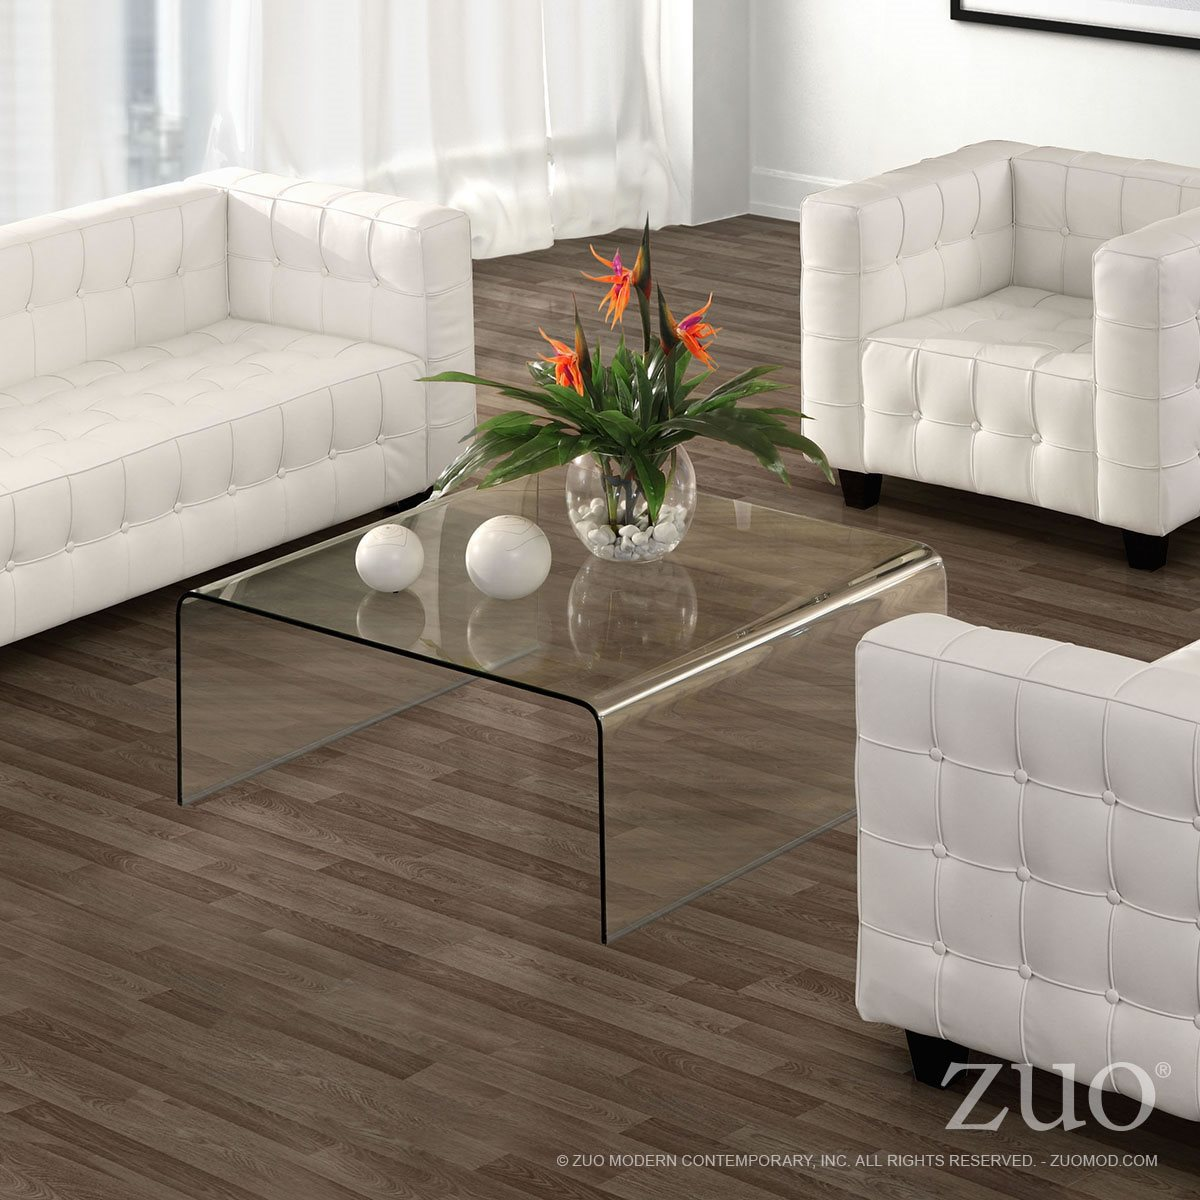 Zuo Modern 404119 Sojourn Modern Coffee Table Zm 404119